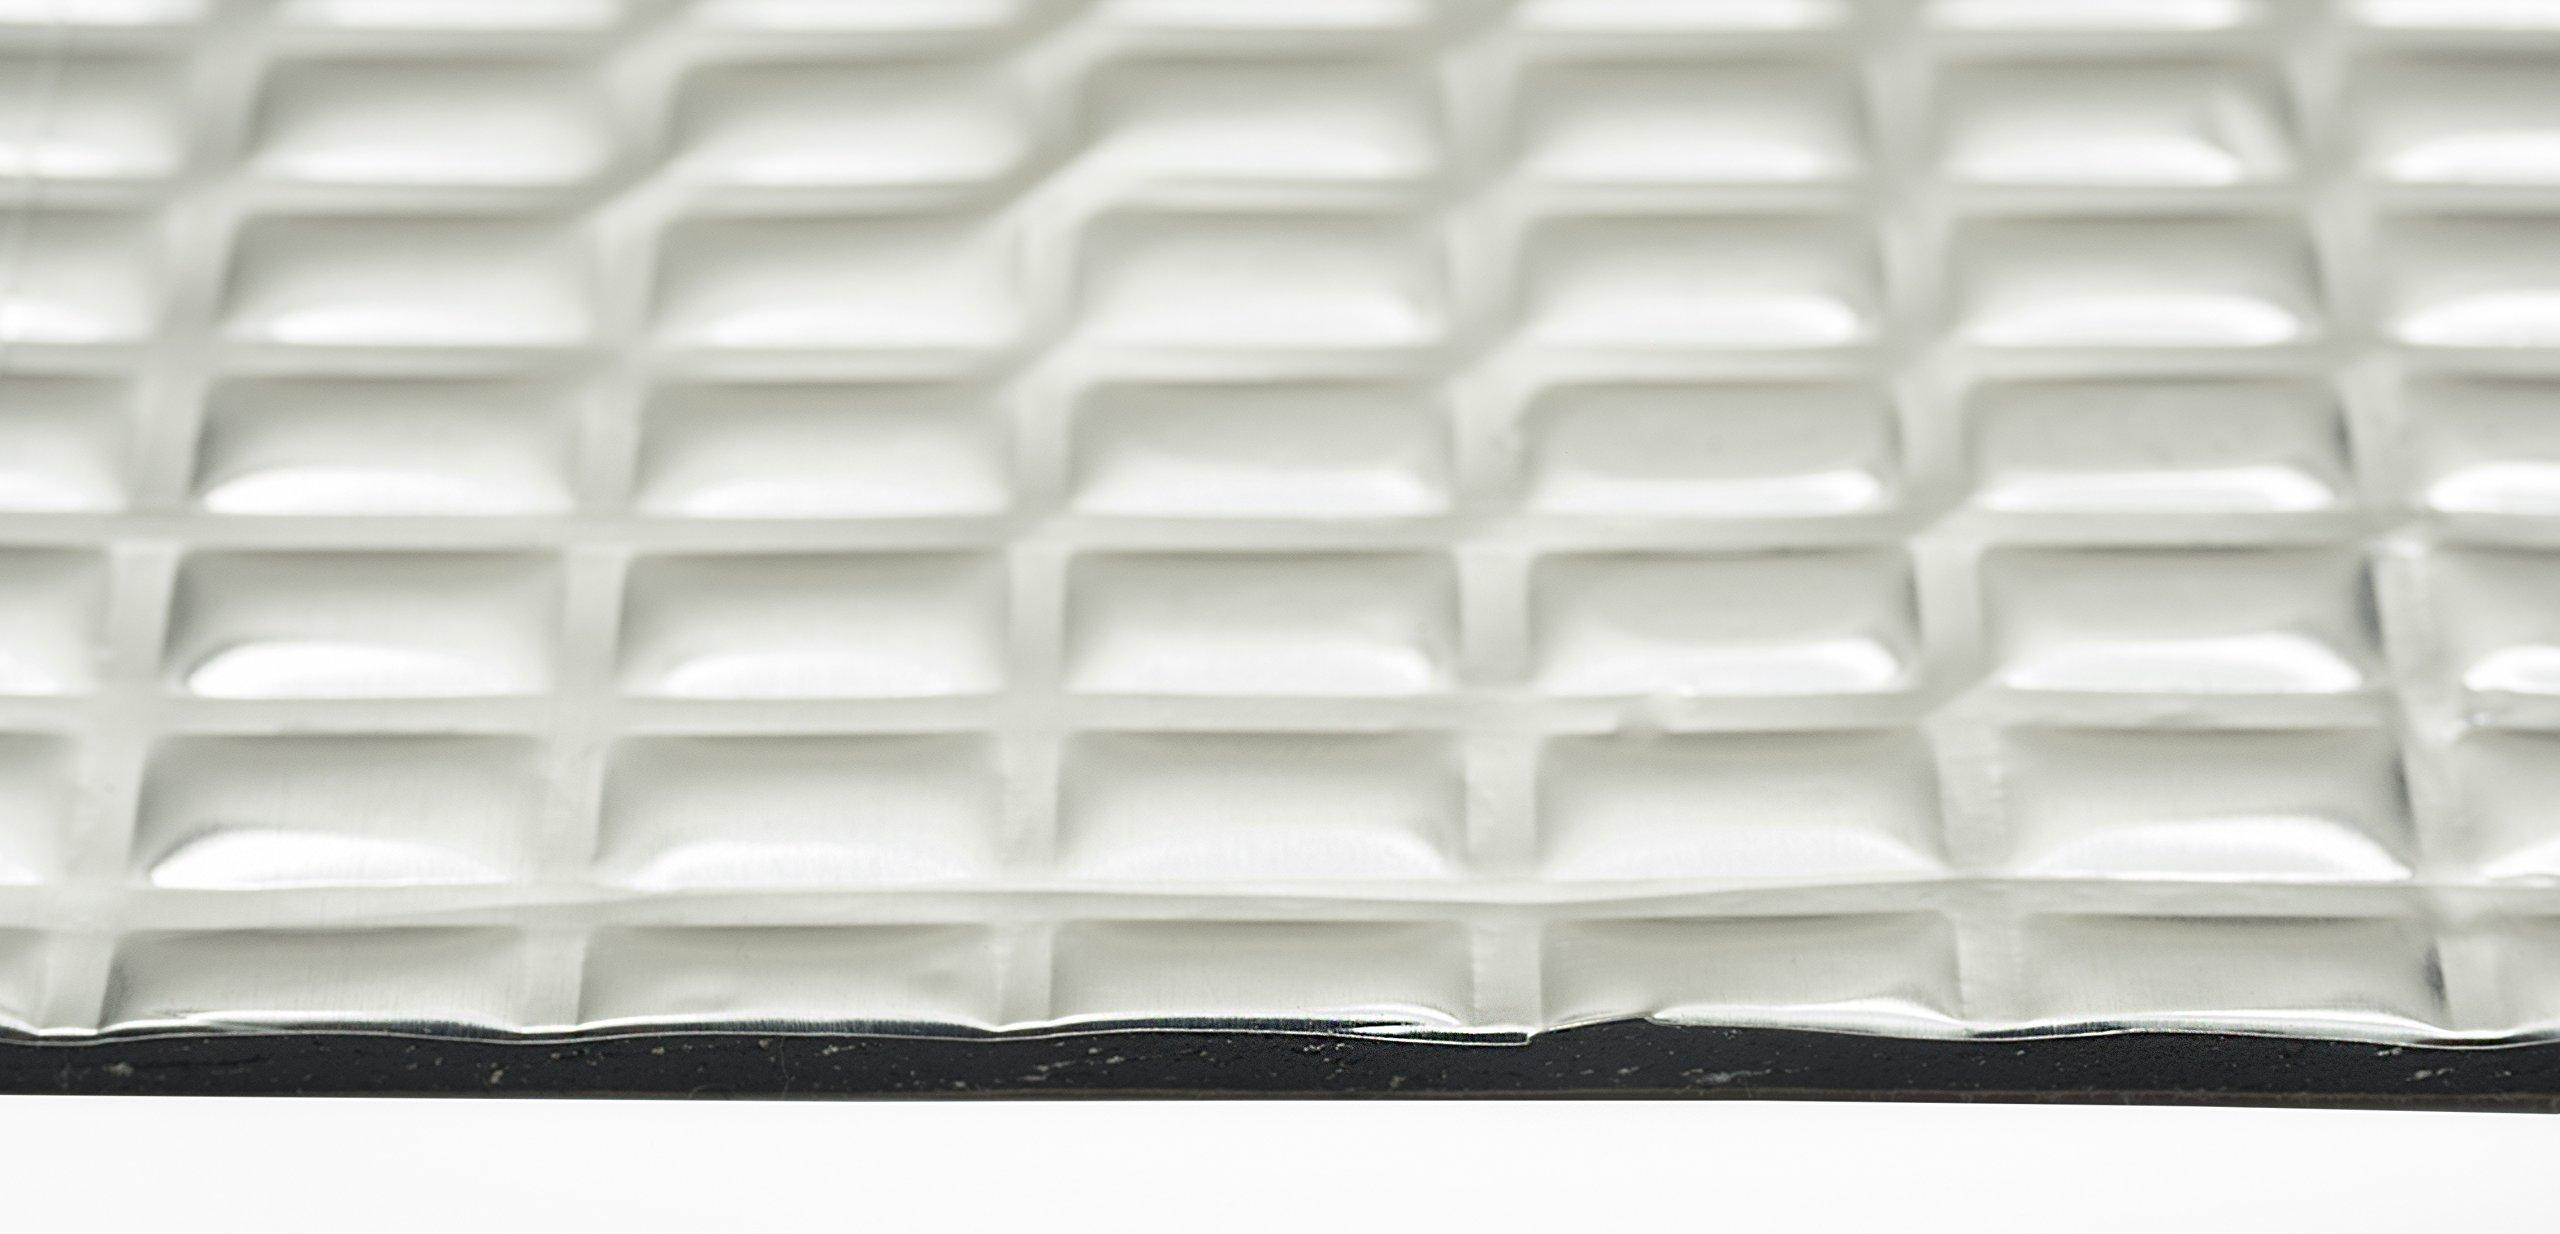 mat mats pack sound cld door coat deadening collections silent shop